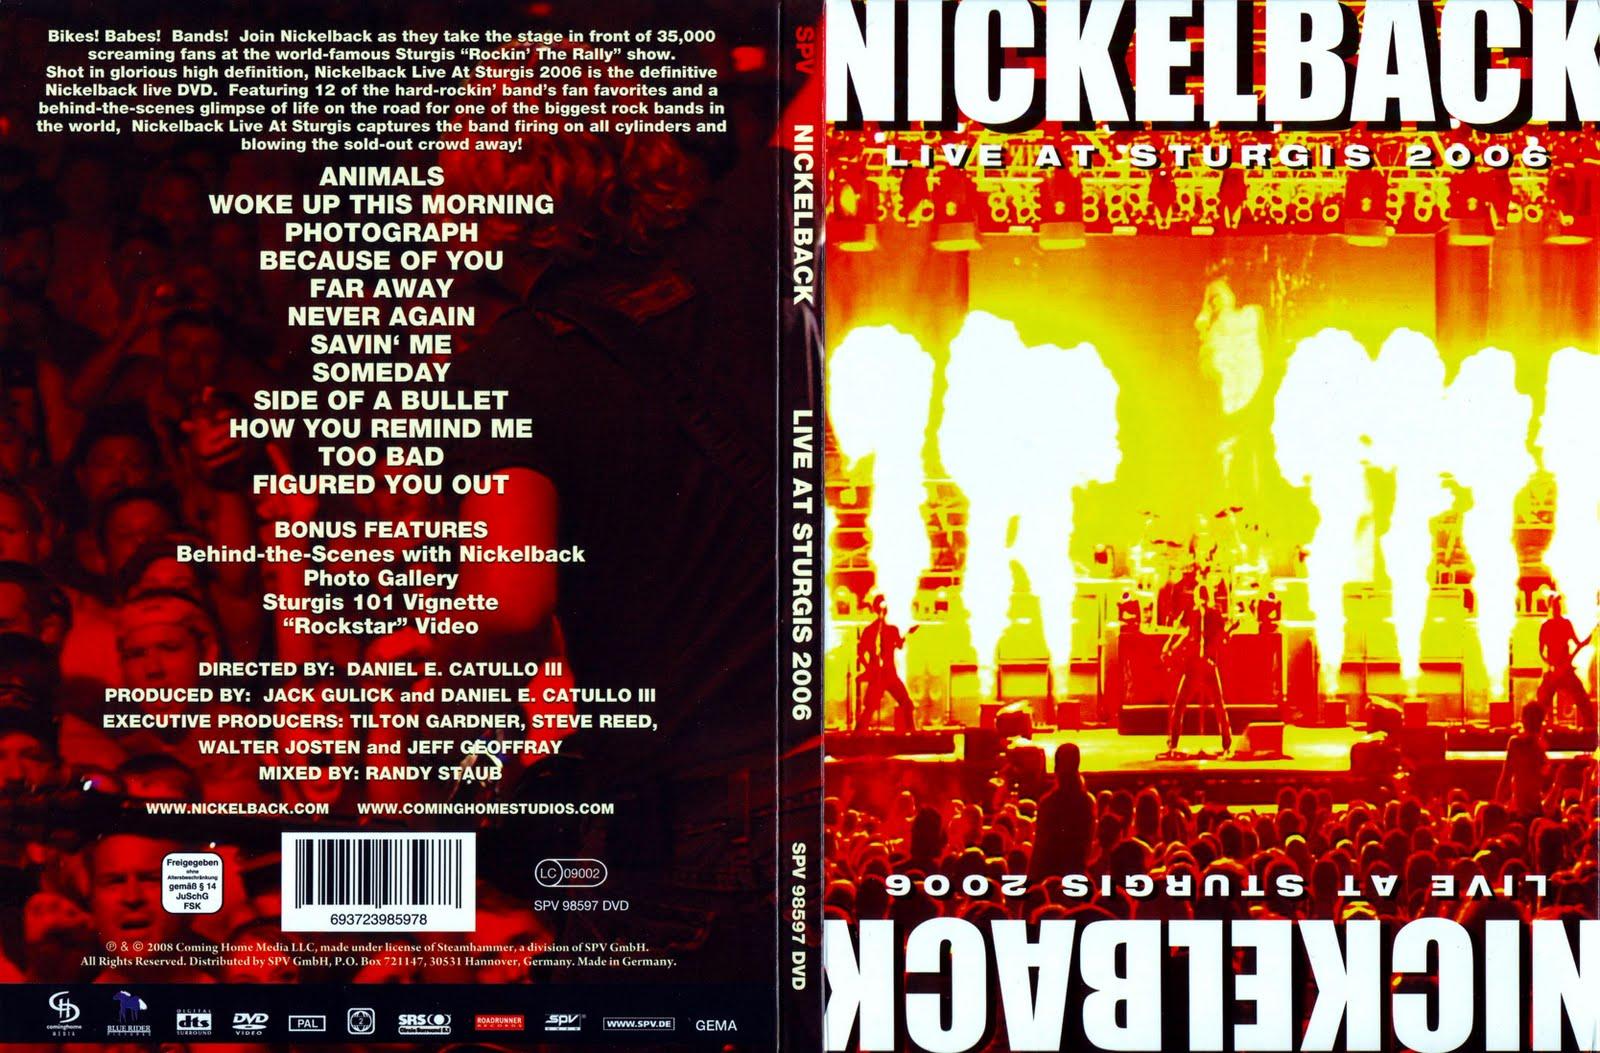 Nickelback: Live At Sturgis Nickelback%2B-%2BLive%2BAt%2BSturgis%2B2006